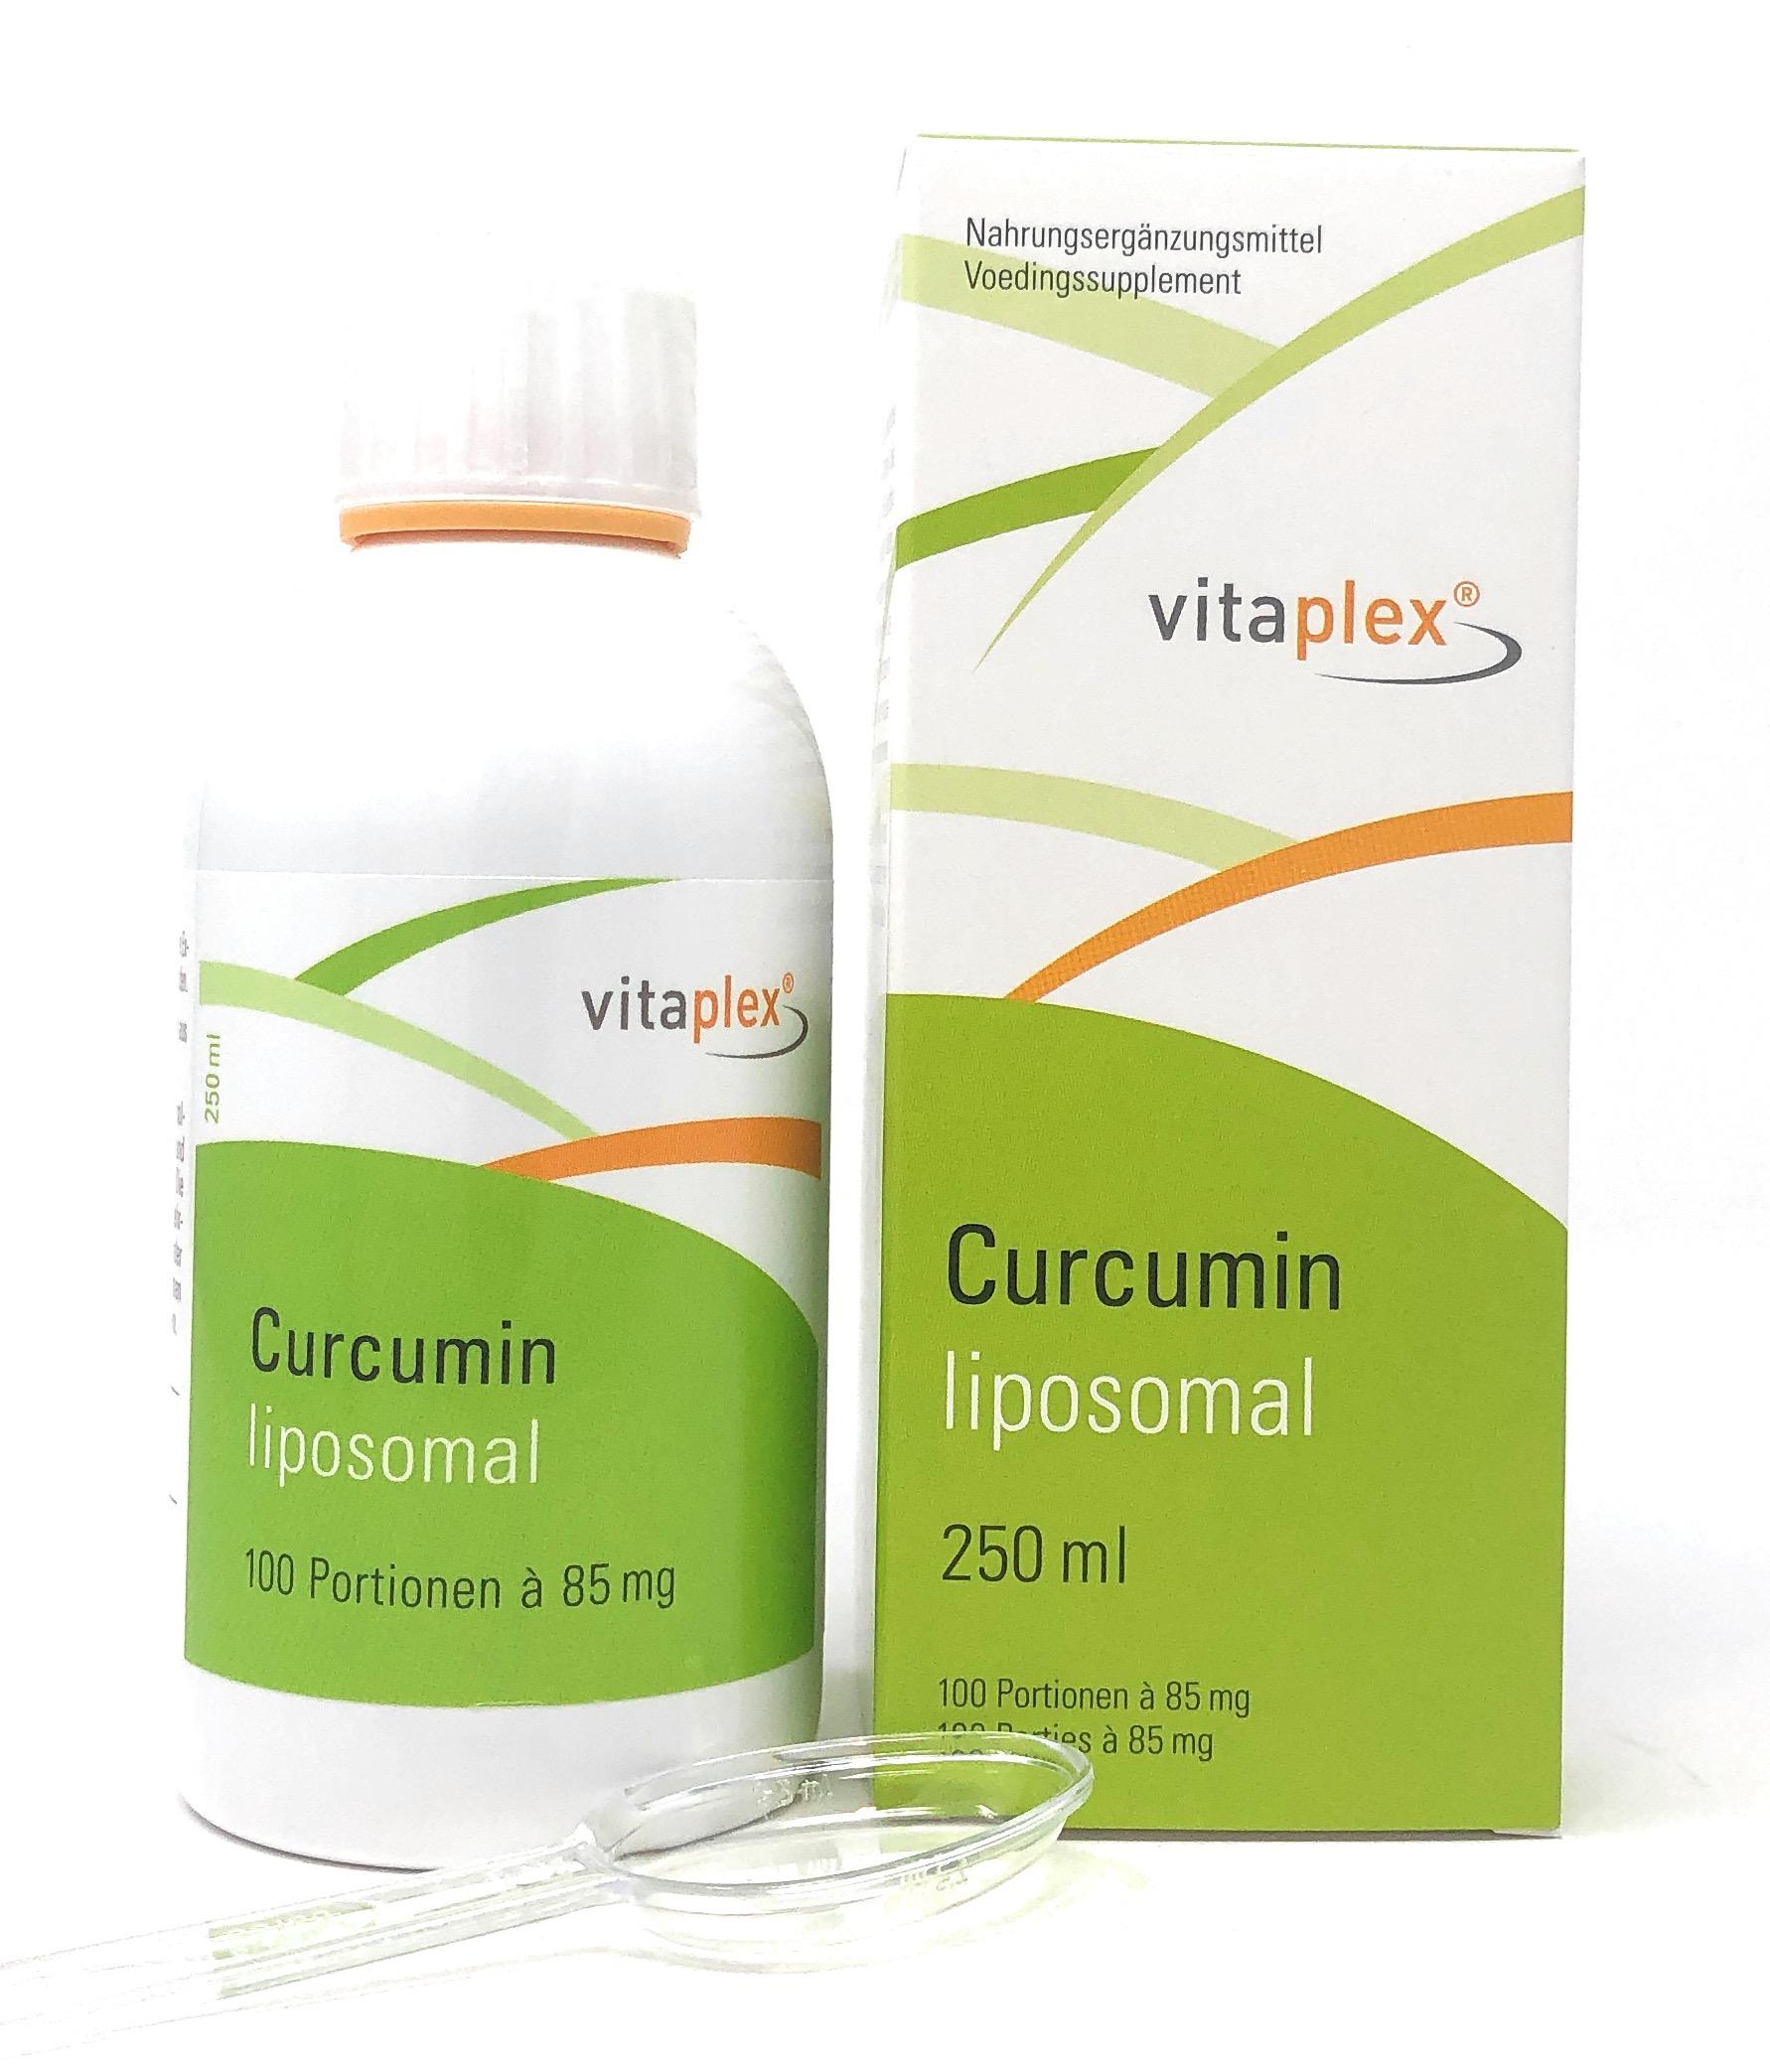 Vitaplex Curcumin liposomal 250ml (100 Portionen à 85mg)